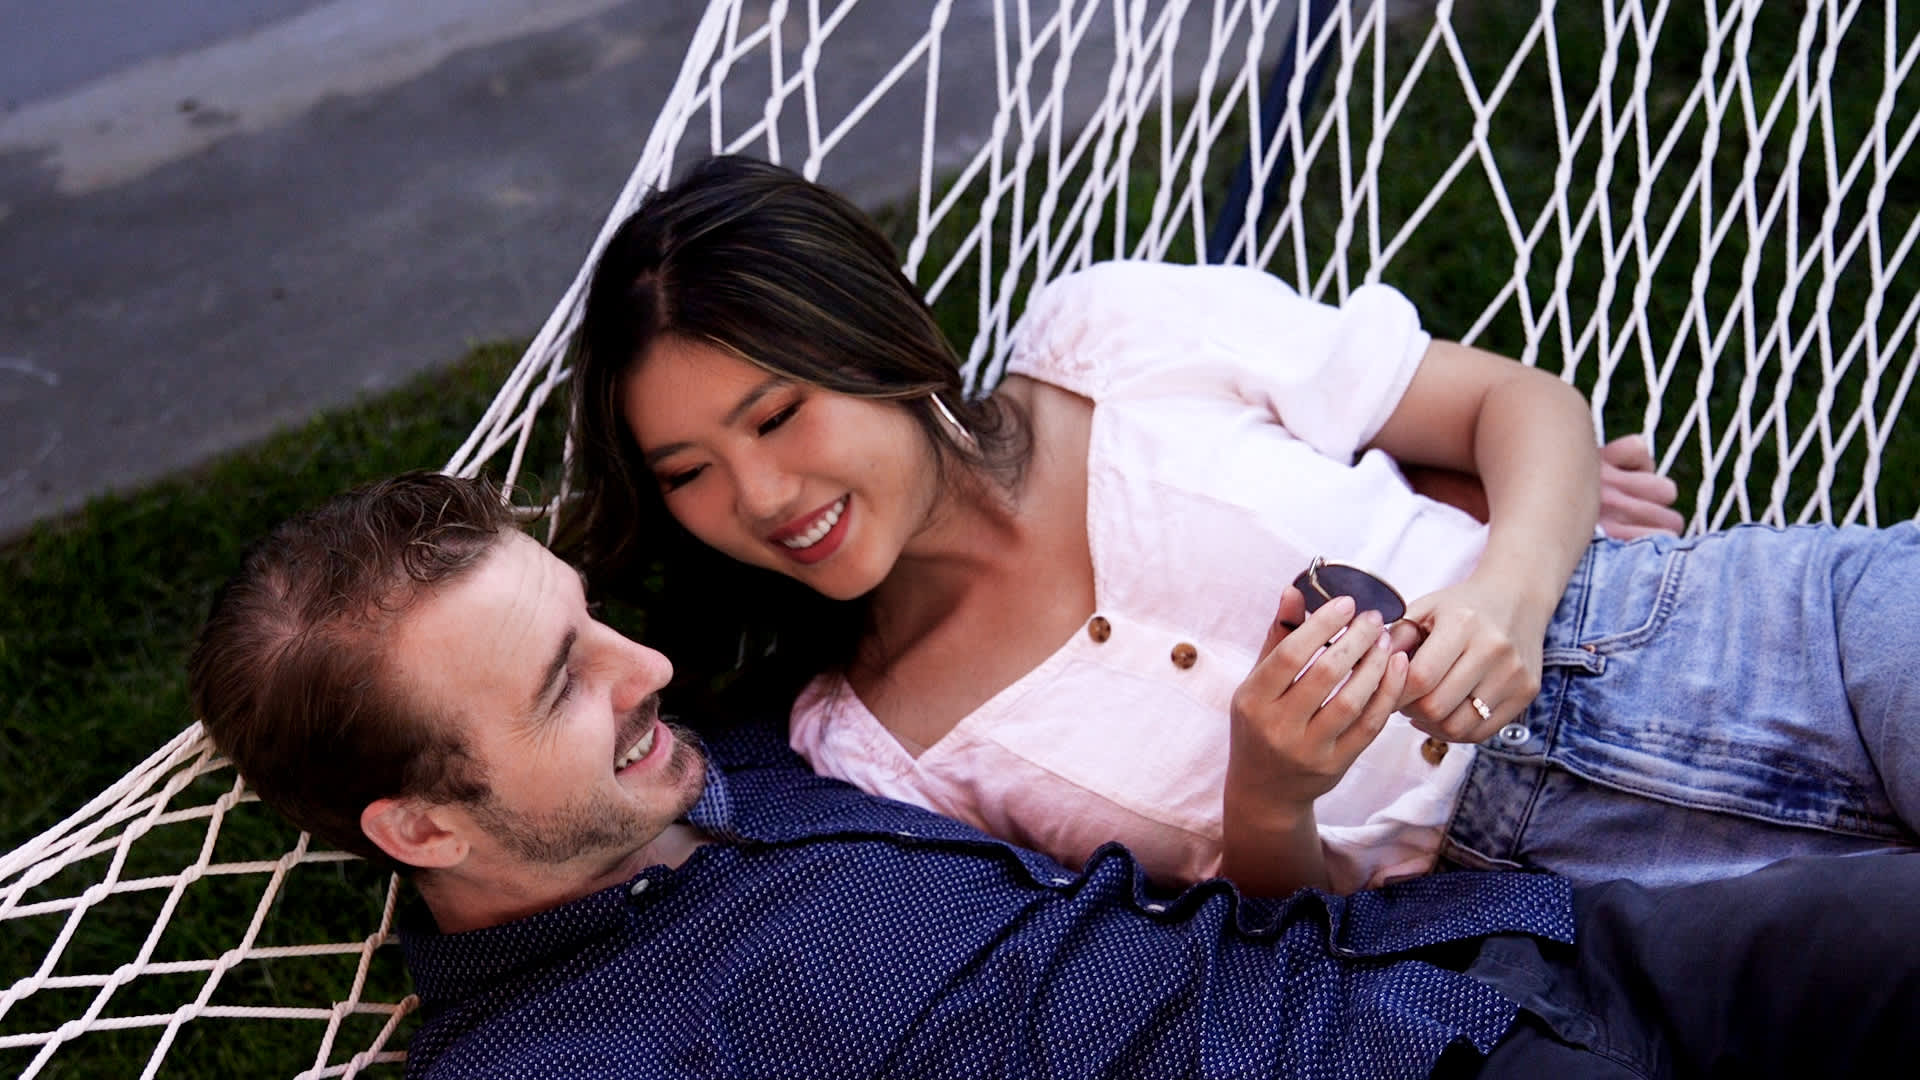 Kim Liao and her husband Greg Bollweg relax in their backyard.